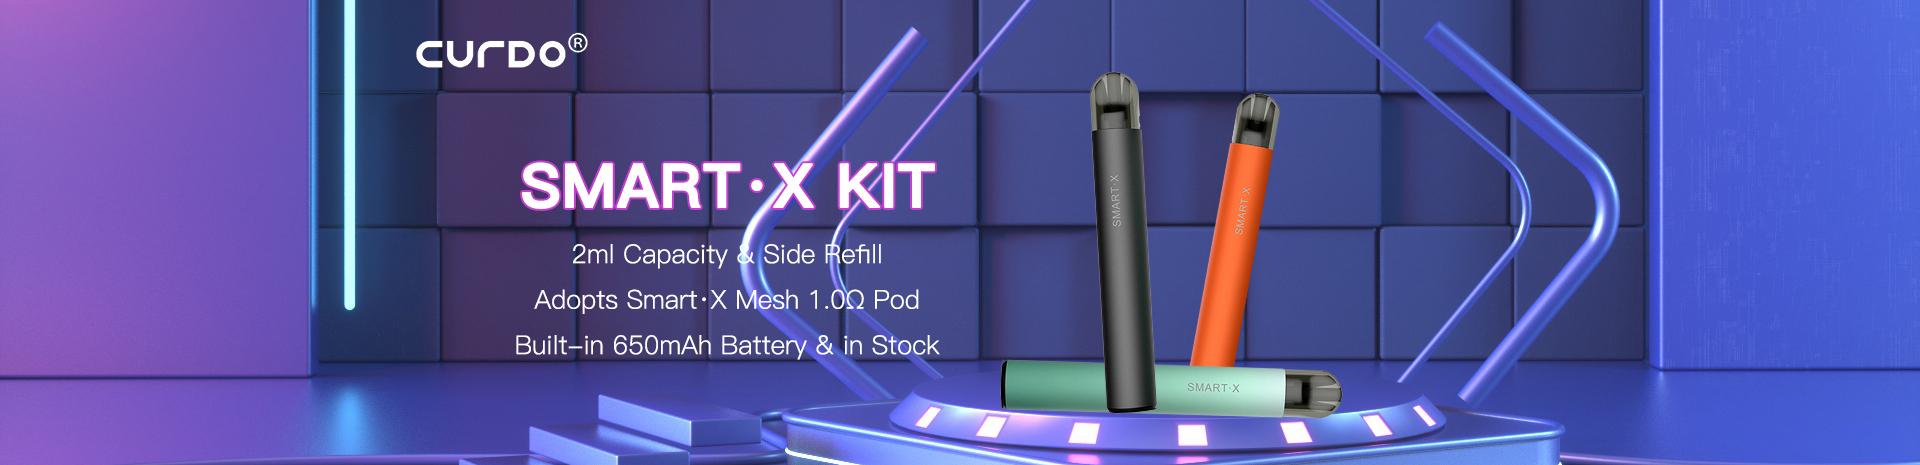 Curdo SmartX Kit Banner